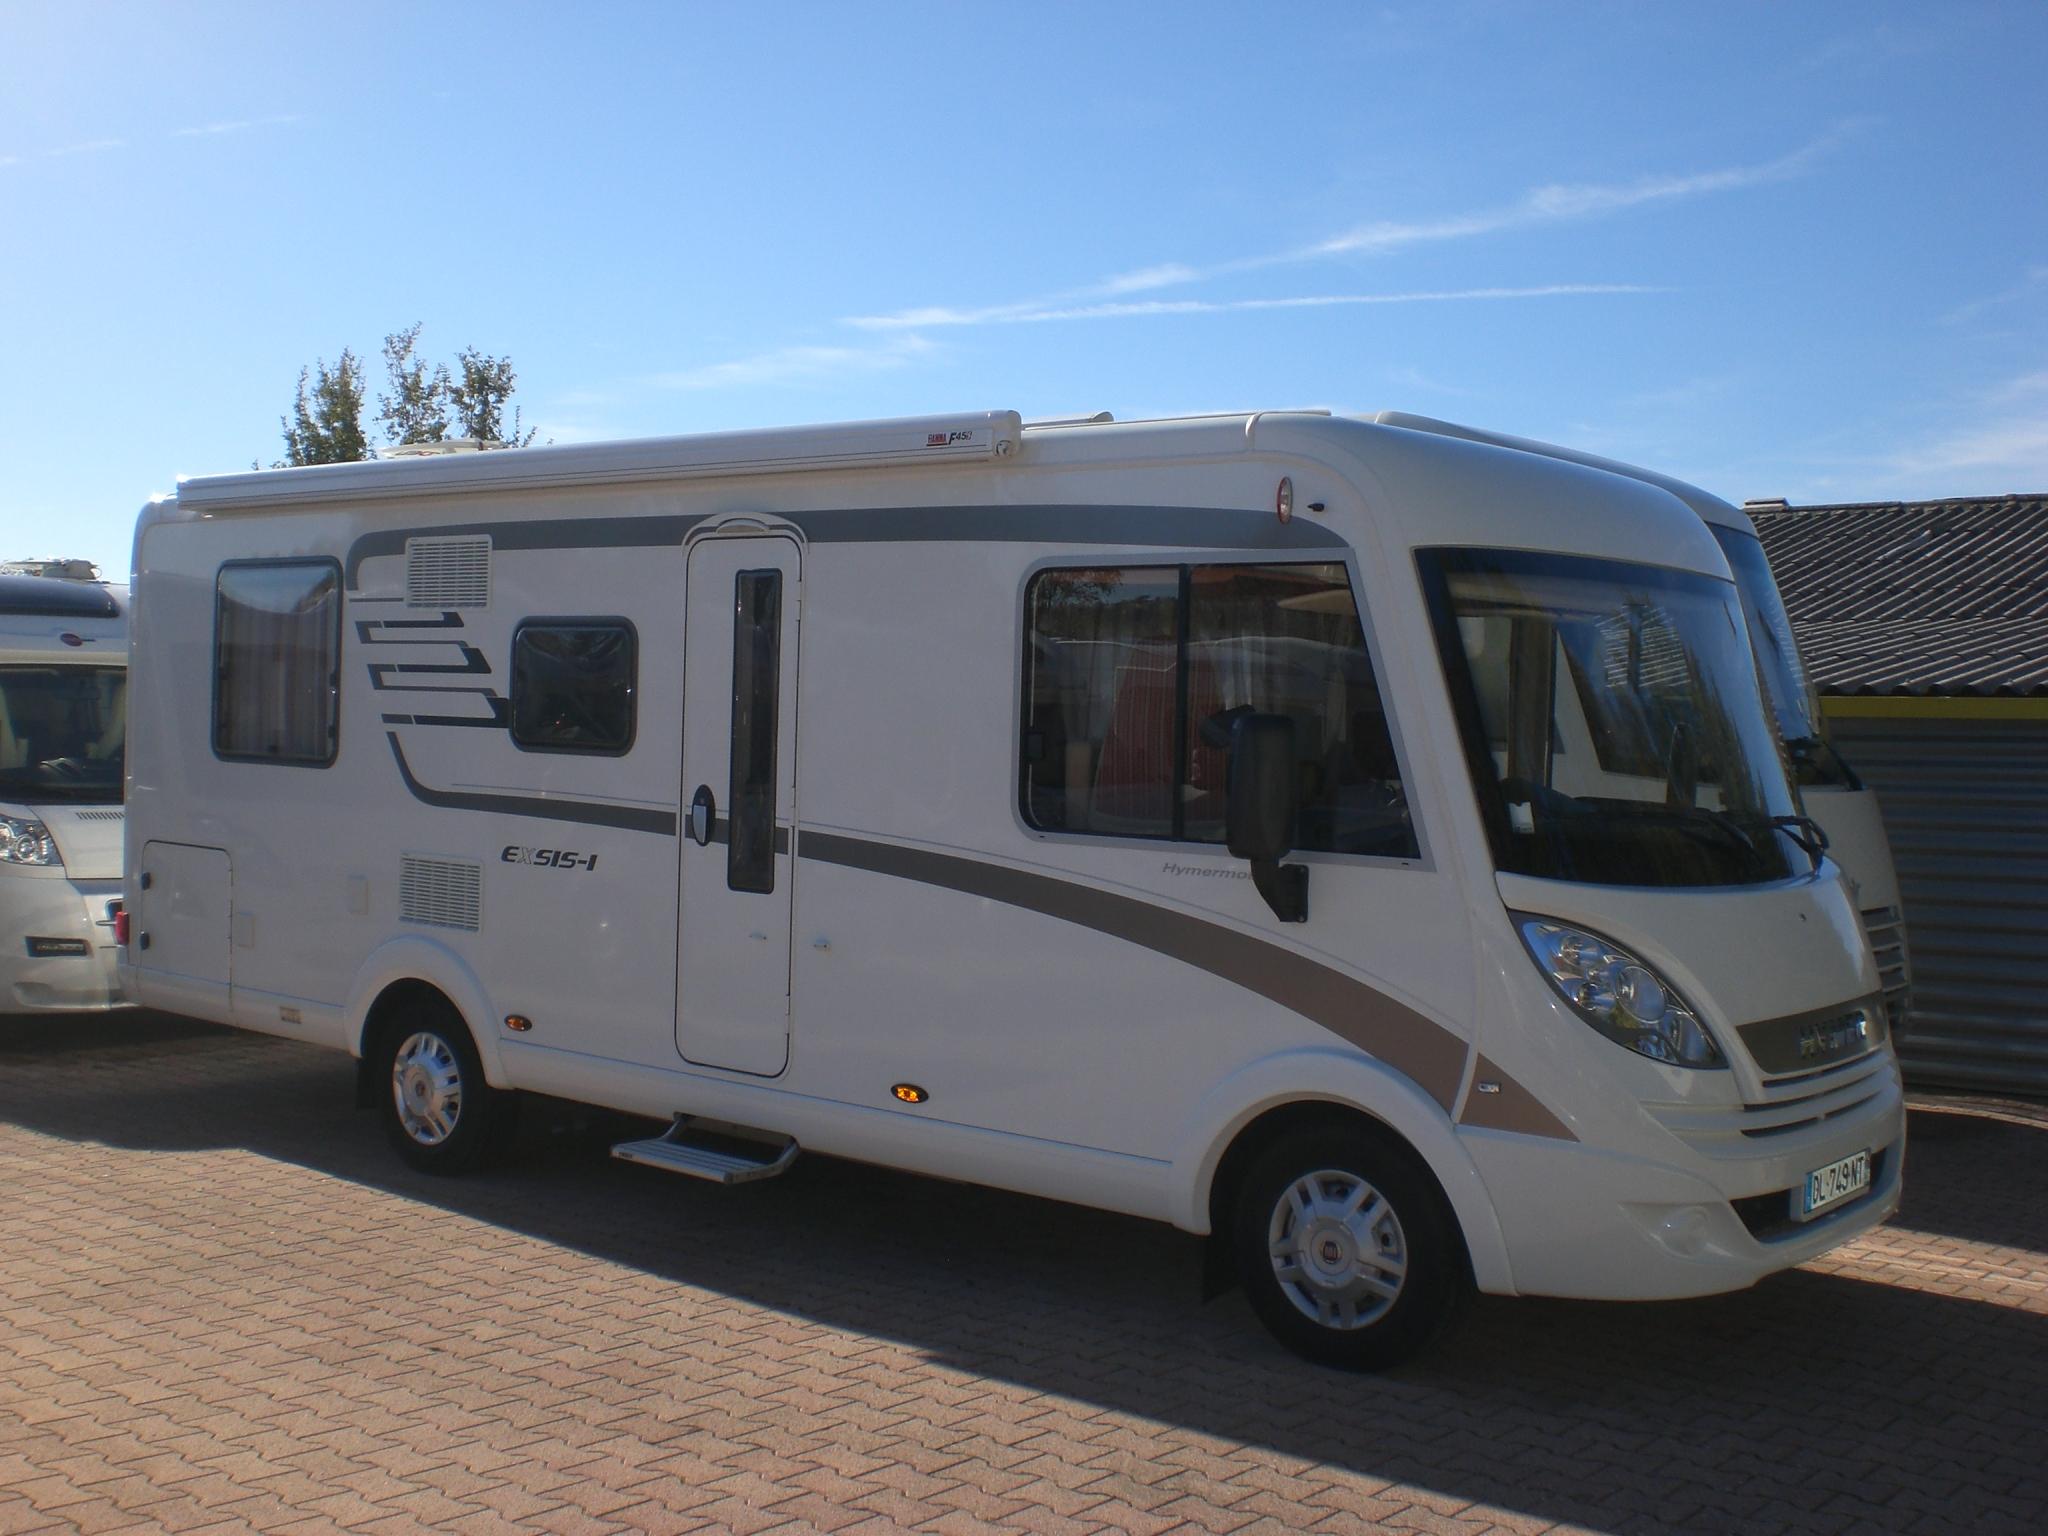 hymer exsis i 698 occasion de 2014 fiat camping car en vente l 39 etrat loire 42. Black Bedroom Furniture Sets. Home Design Ideas